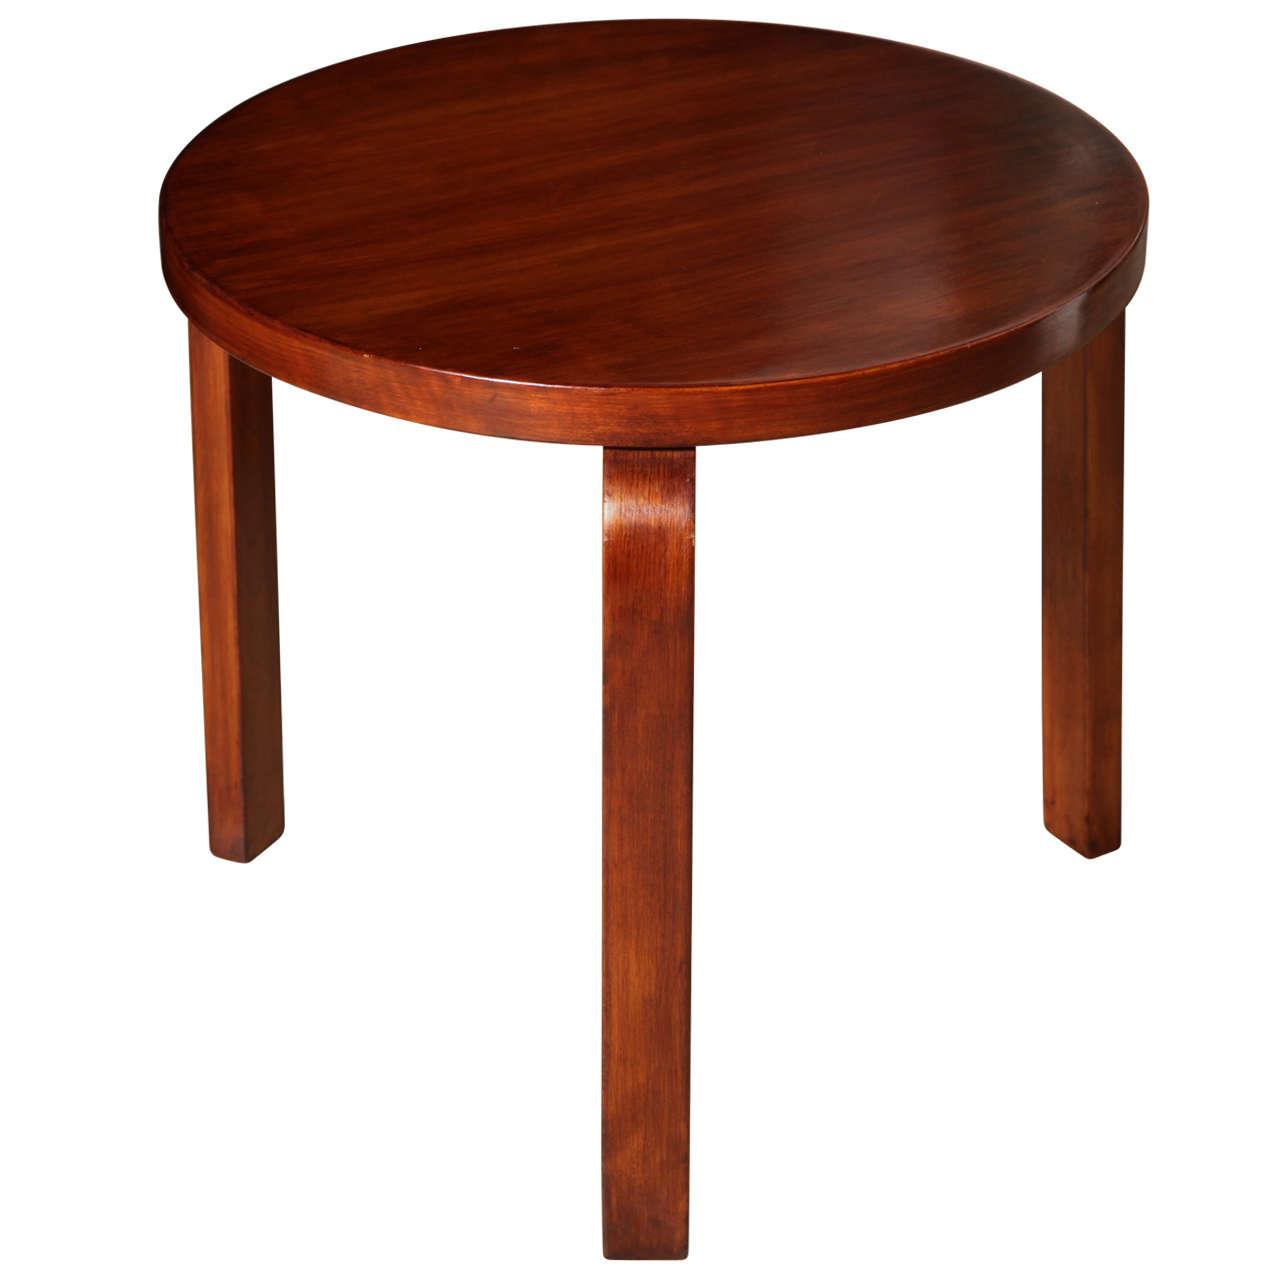 pre war alvar aalto occassional table at 1stdibs. Black Bedroom Furniture Sets. Home Design Ideas